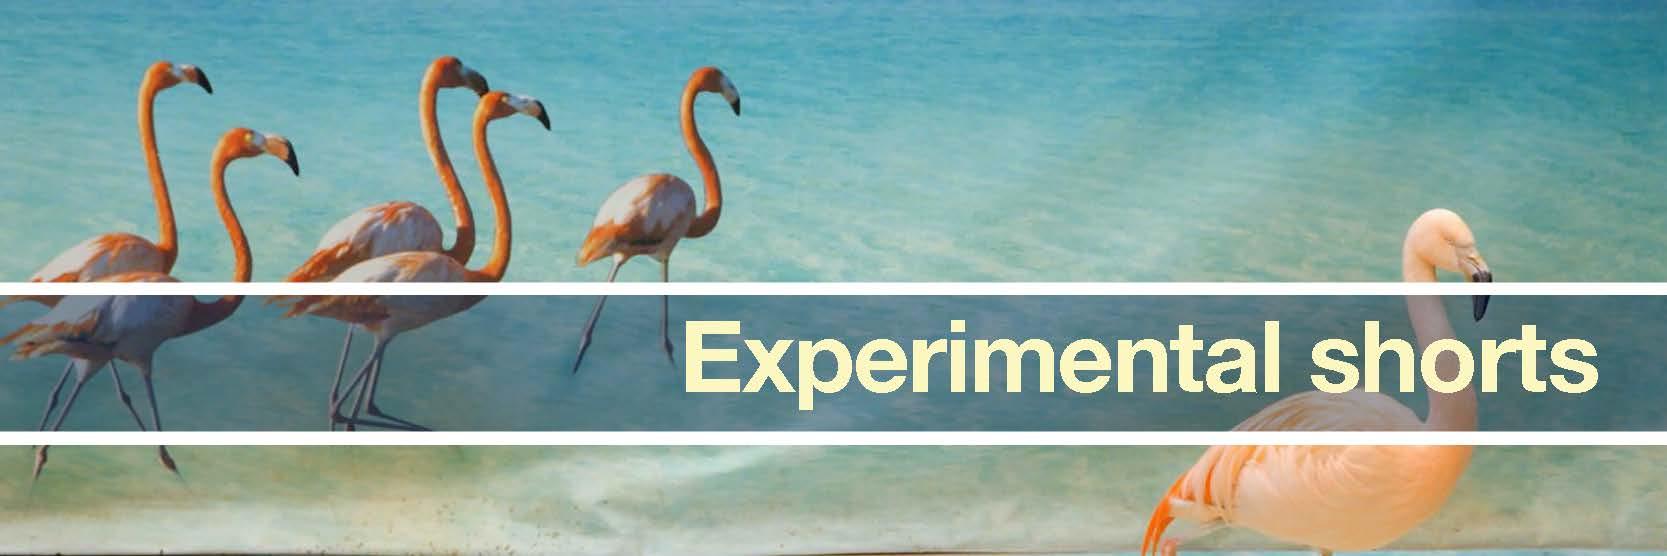 experimental shorts banner.jpg